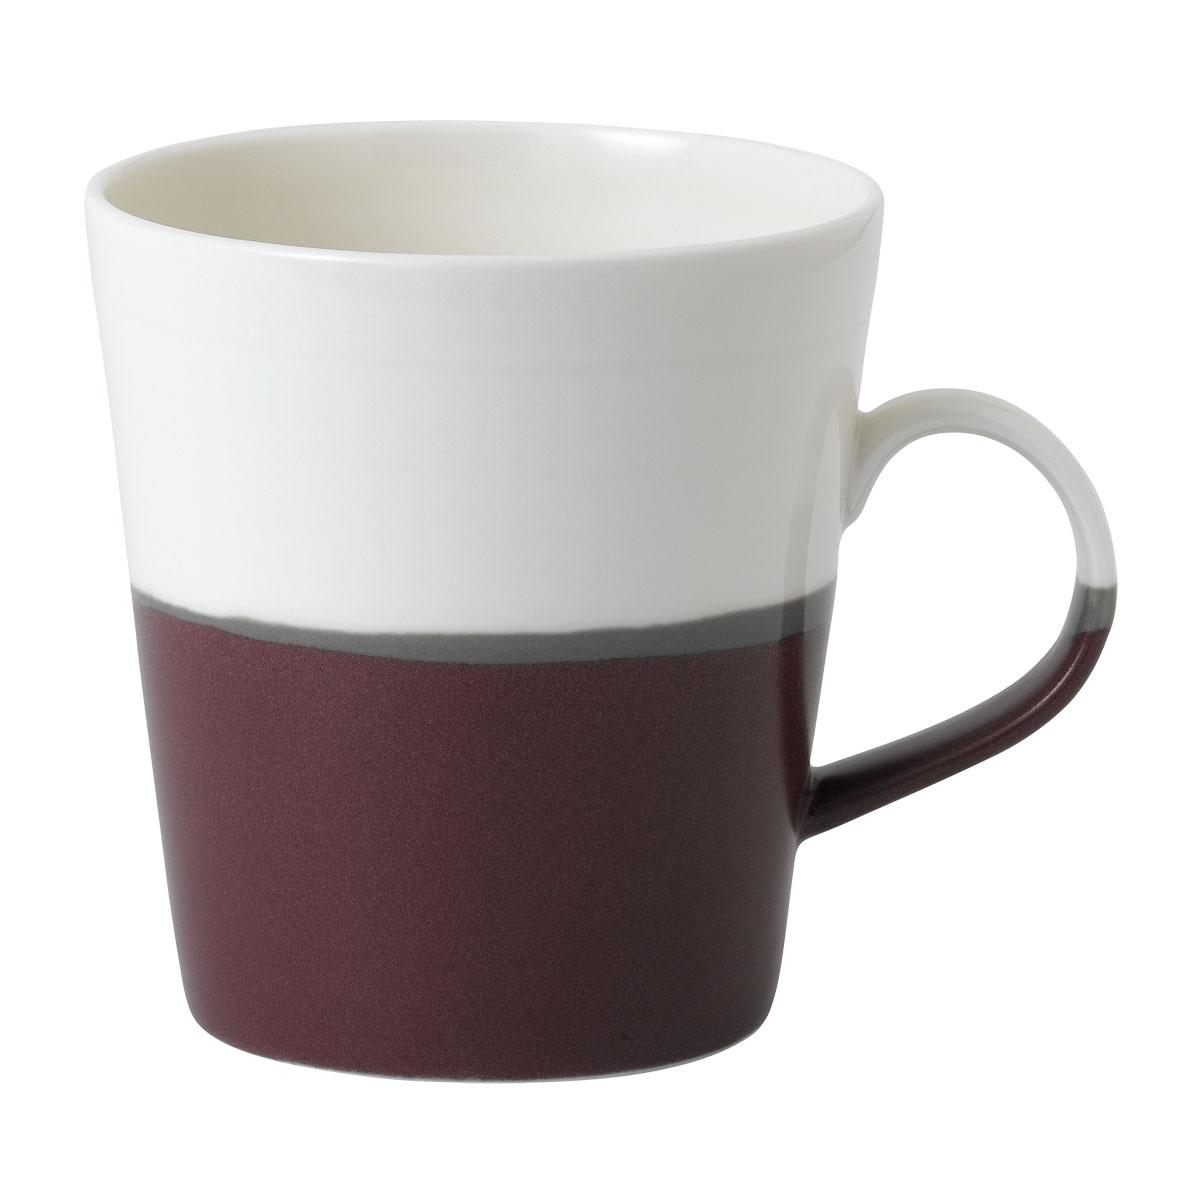 Royal Doulton Coffee Studio Grande Mug Plum, Single